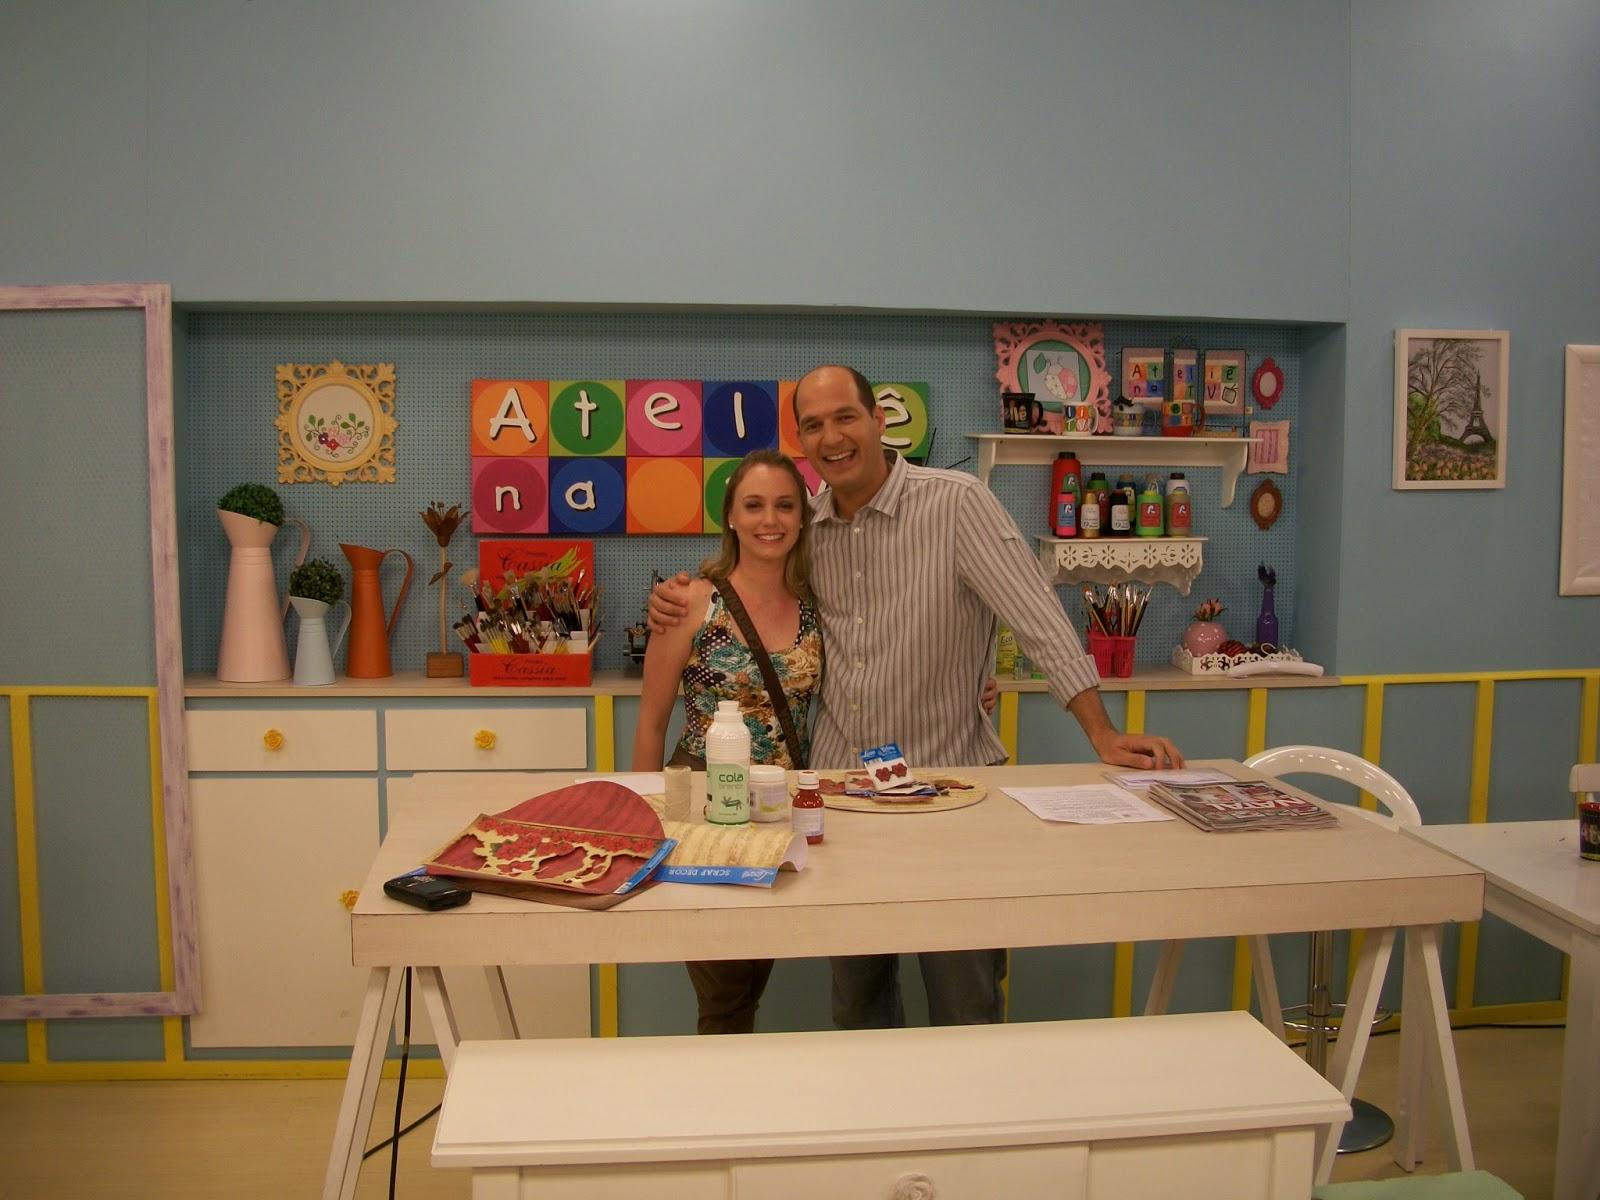 Atelie na TV - Priscila Müller